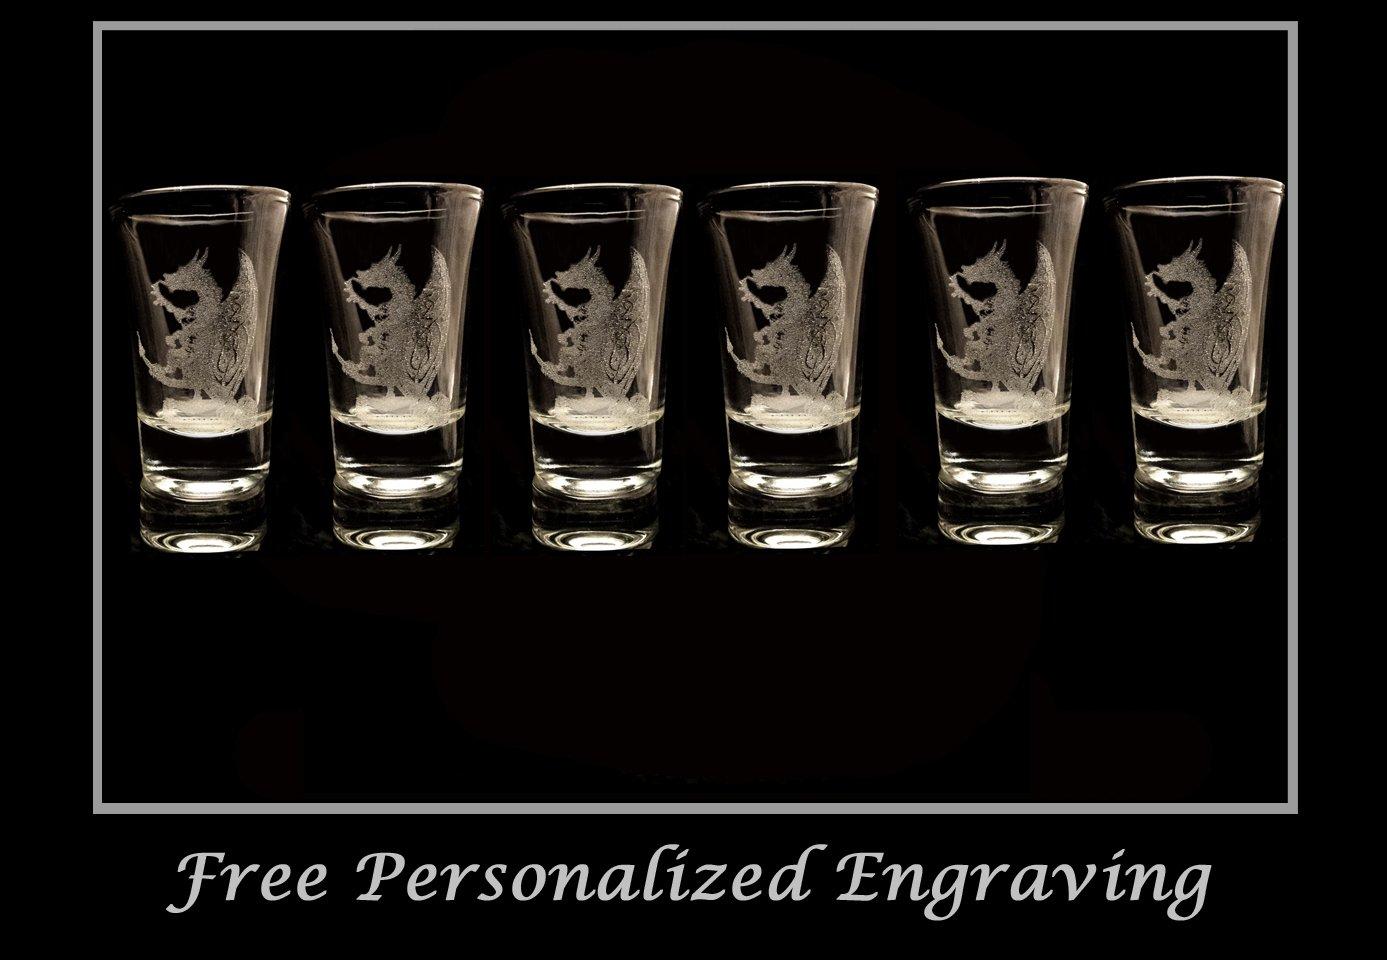 Celtic Dragon Shot Glass Set of 6 - Free Personalized Engravin\